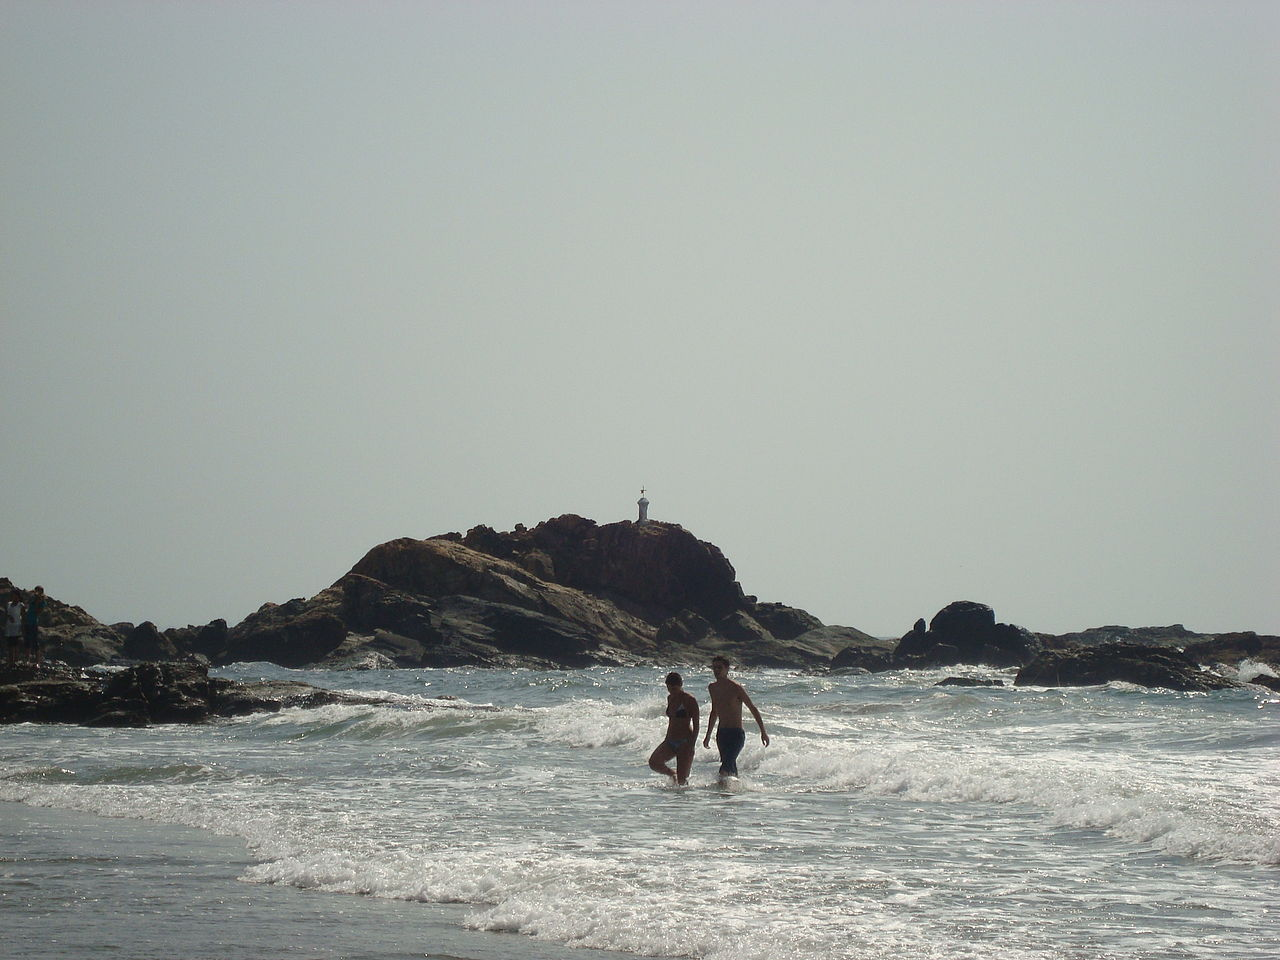 Calangute beach of Goa, India